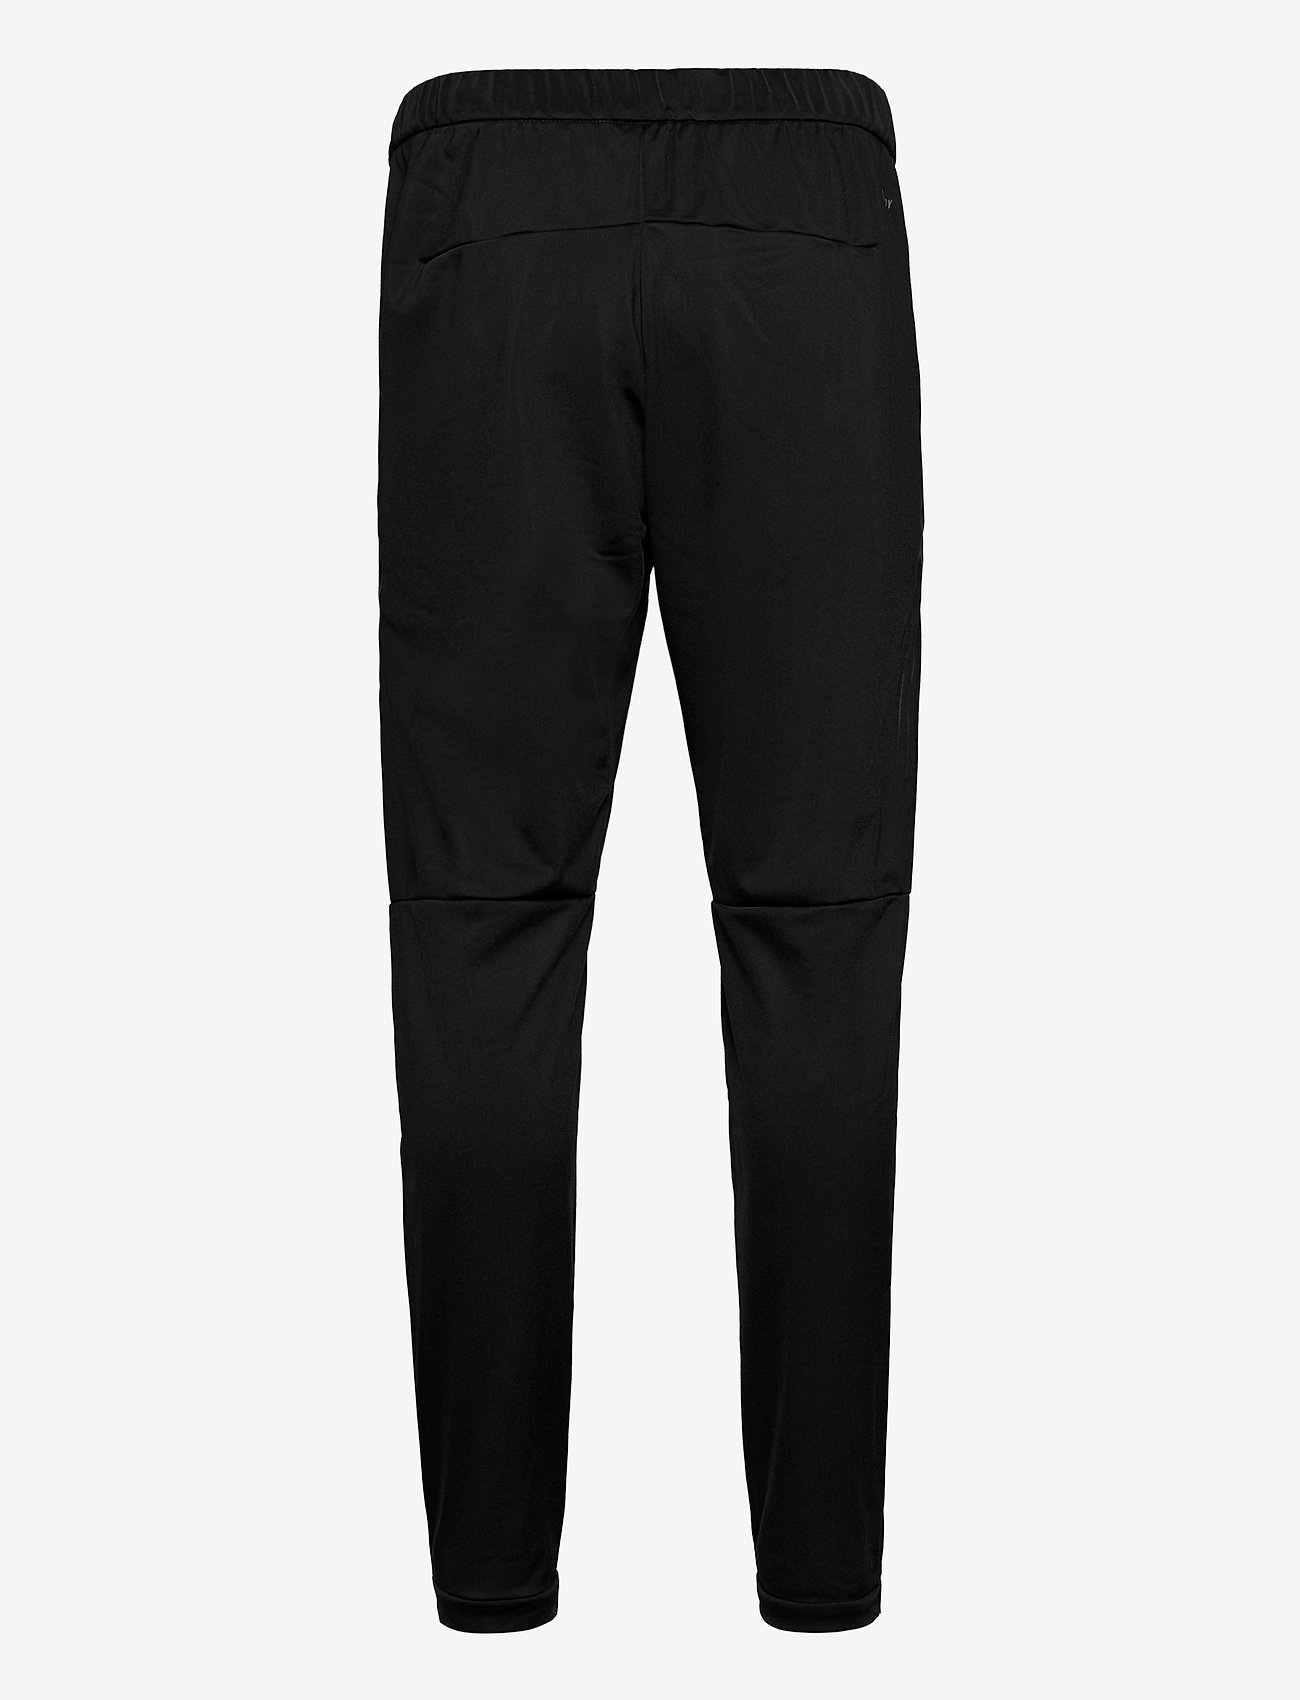 adidas Performance - 3 STRIPES KNIT PANTS - treenihousut - 000/black - 1